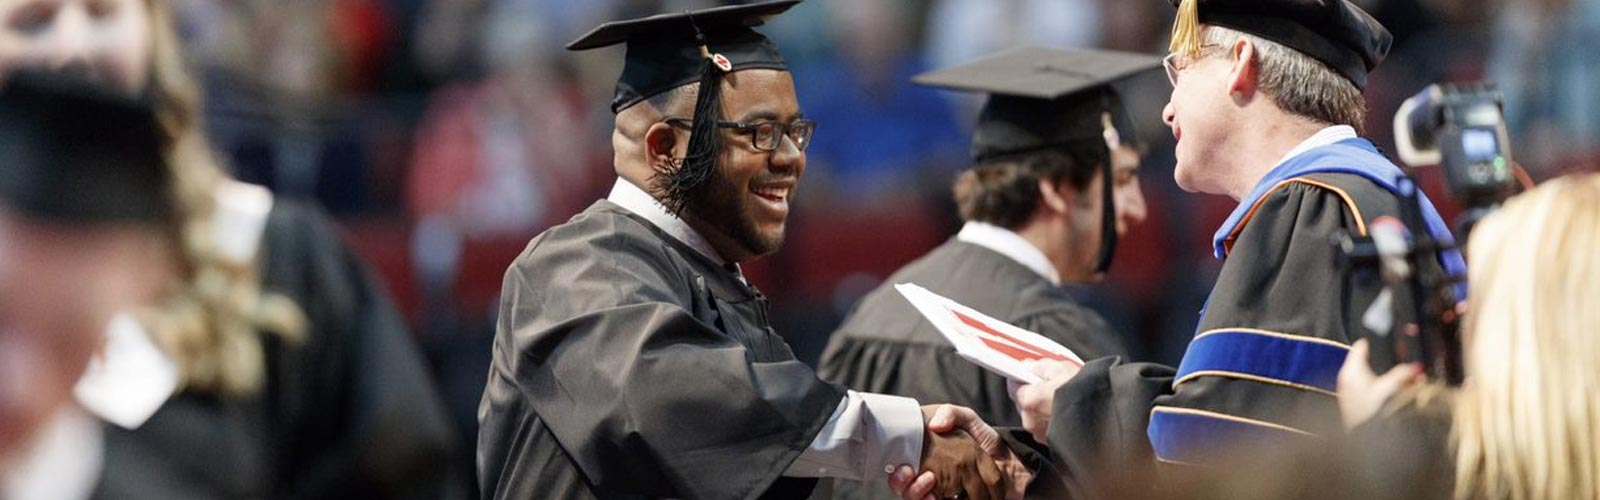 Student receiving degree at graduation.